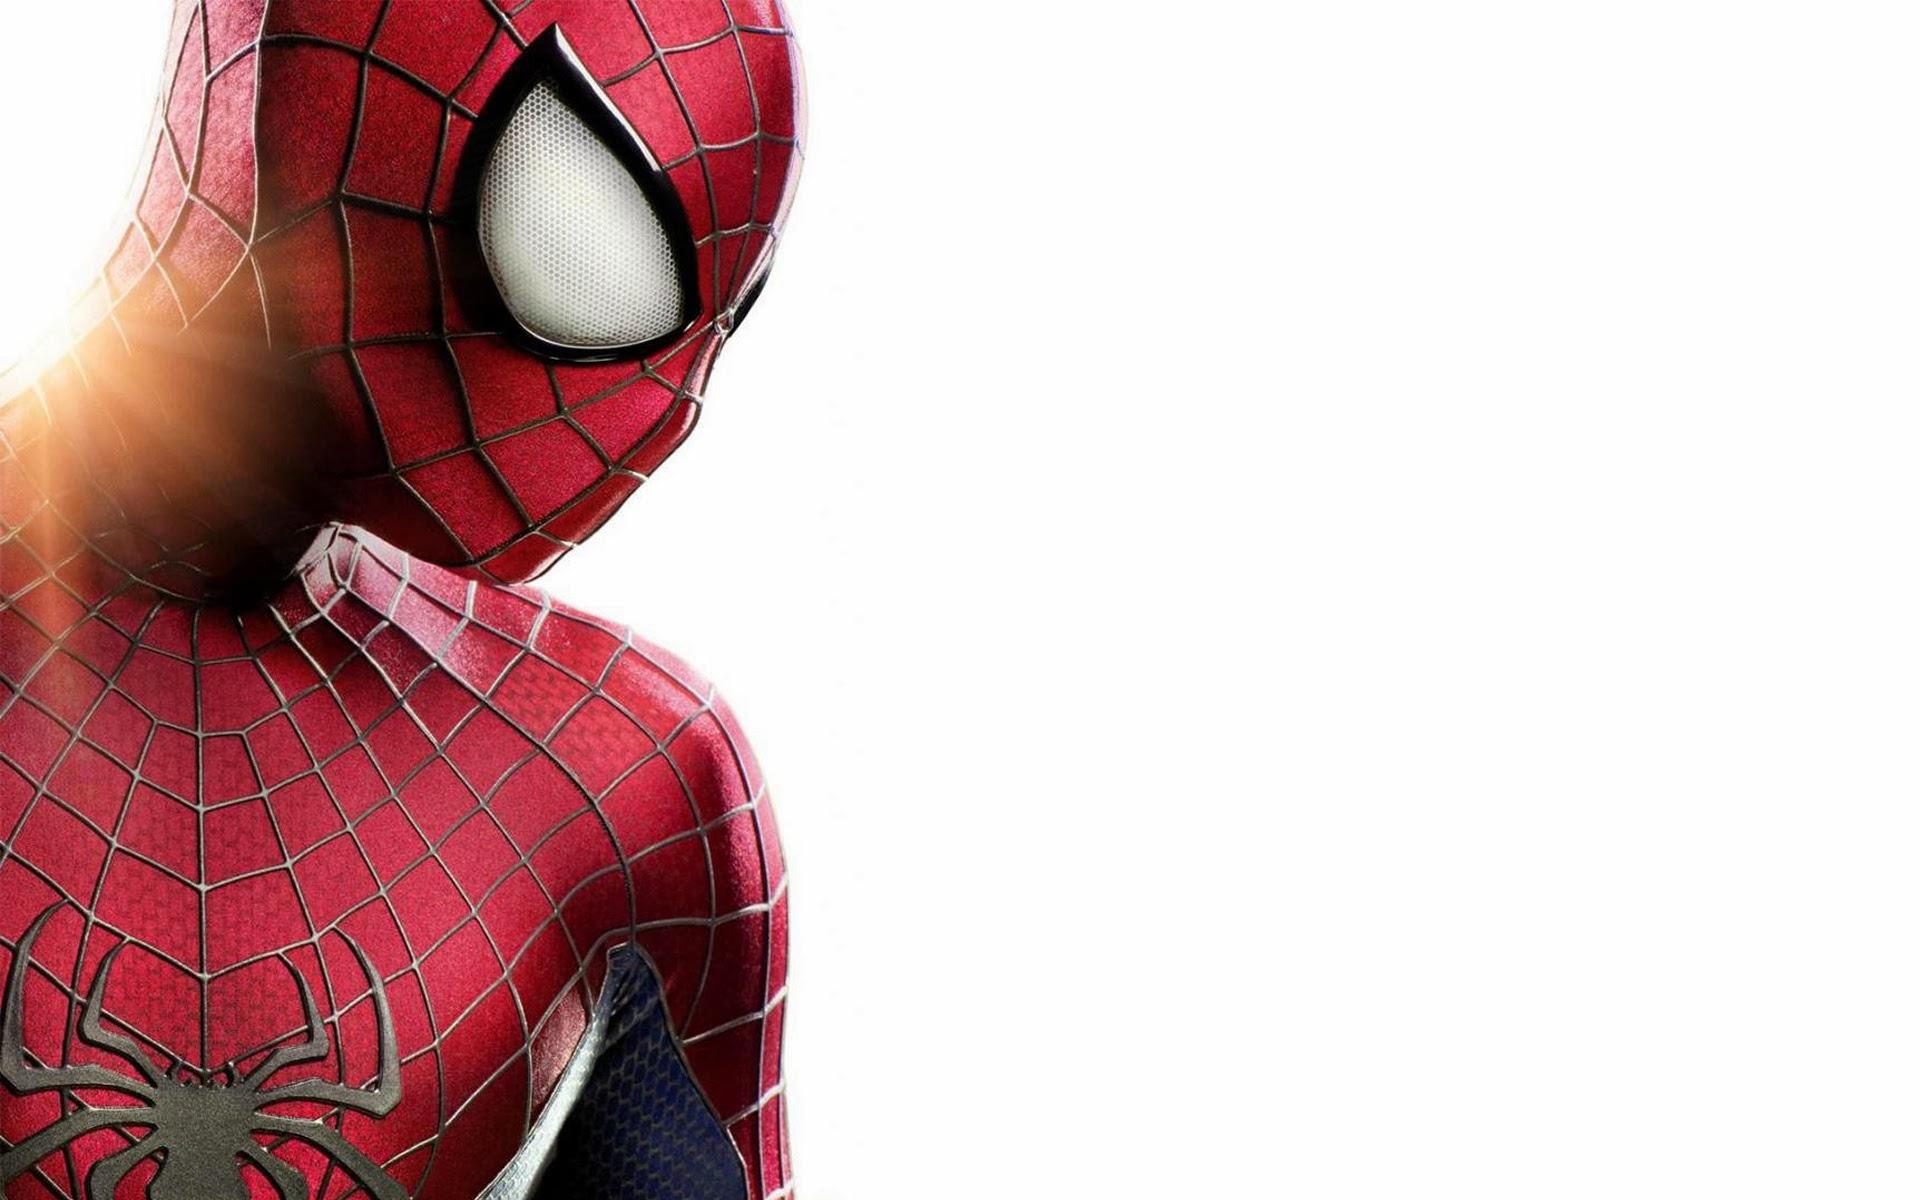 spiderman live wallpaper